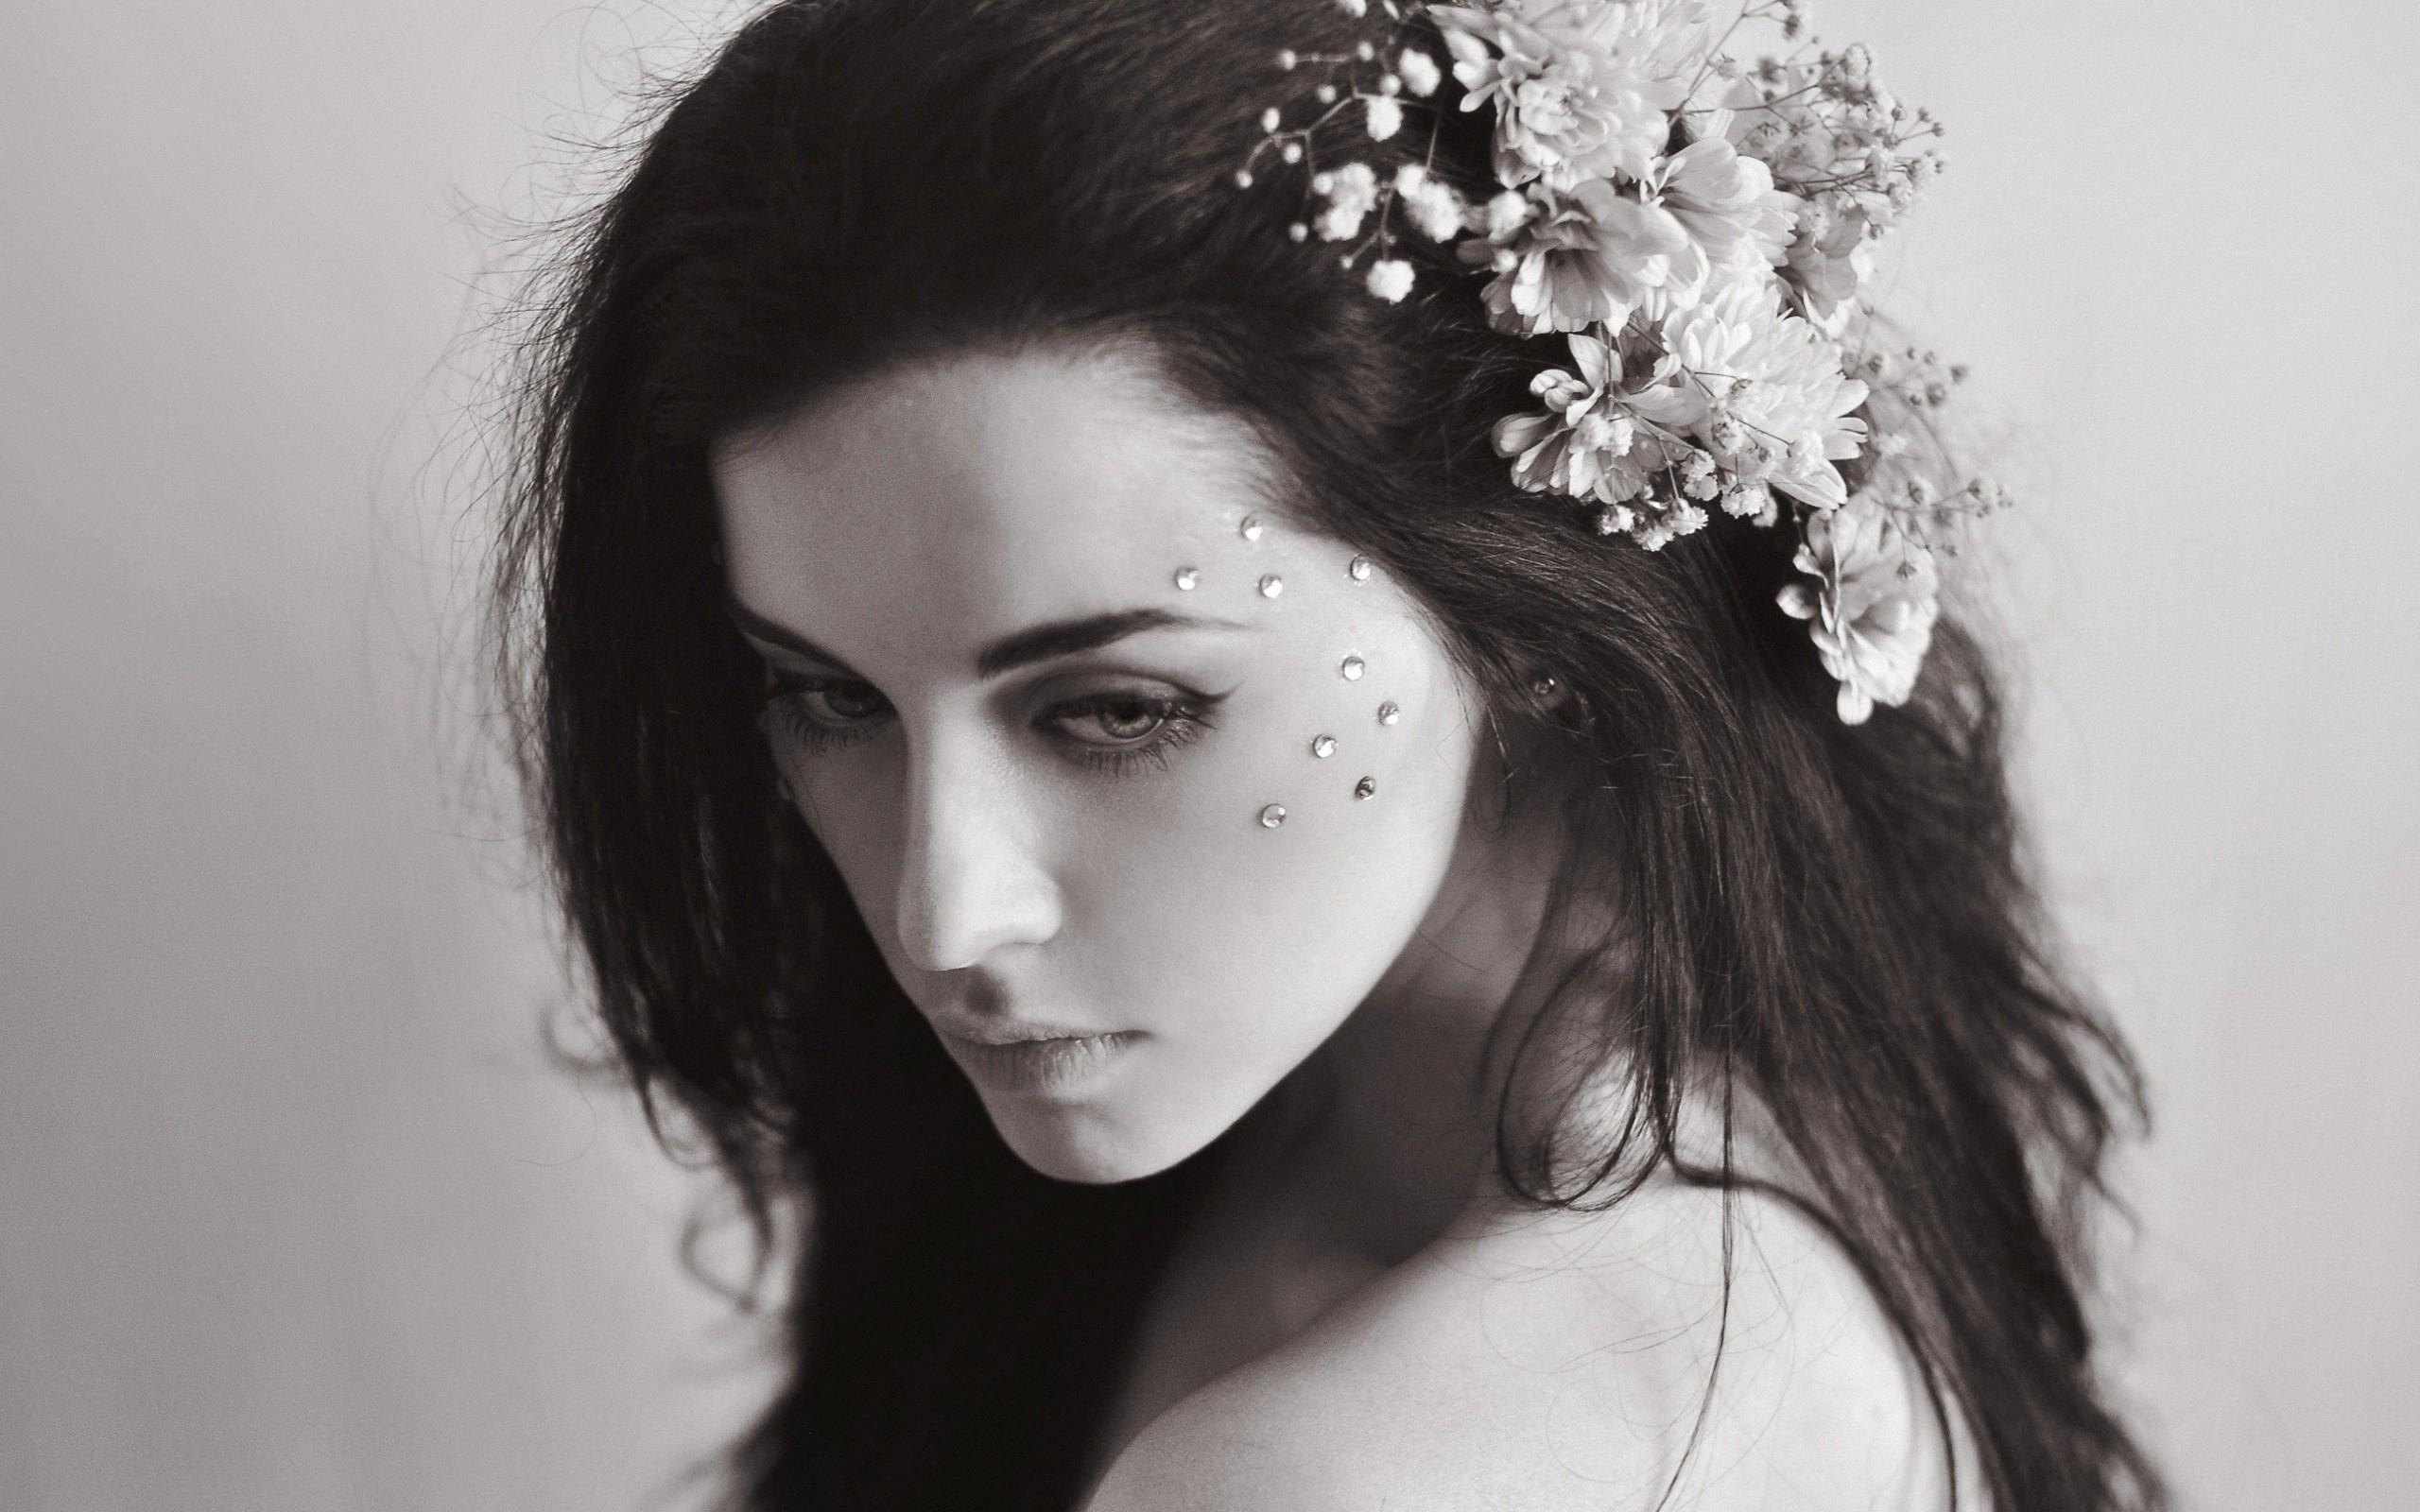 Brunette Hair Jewelry Melancholy Model Black And White